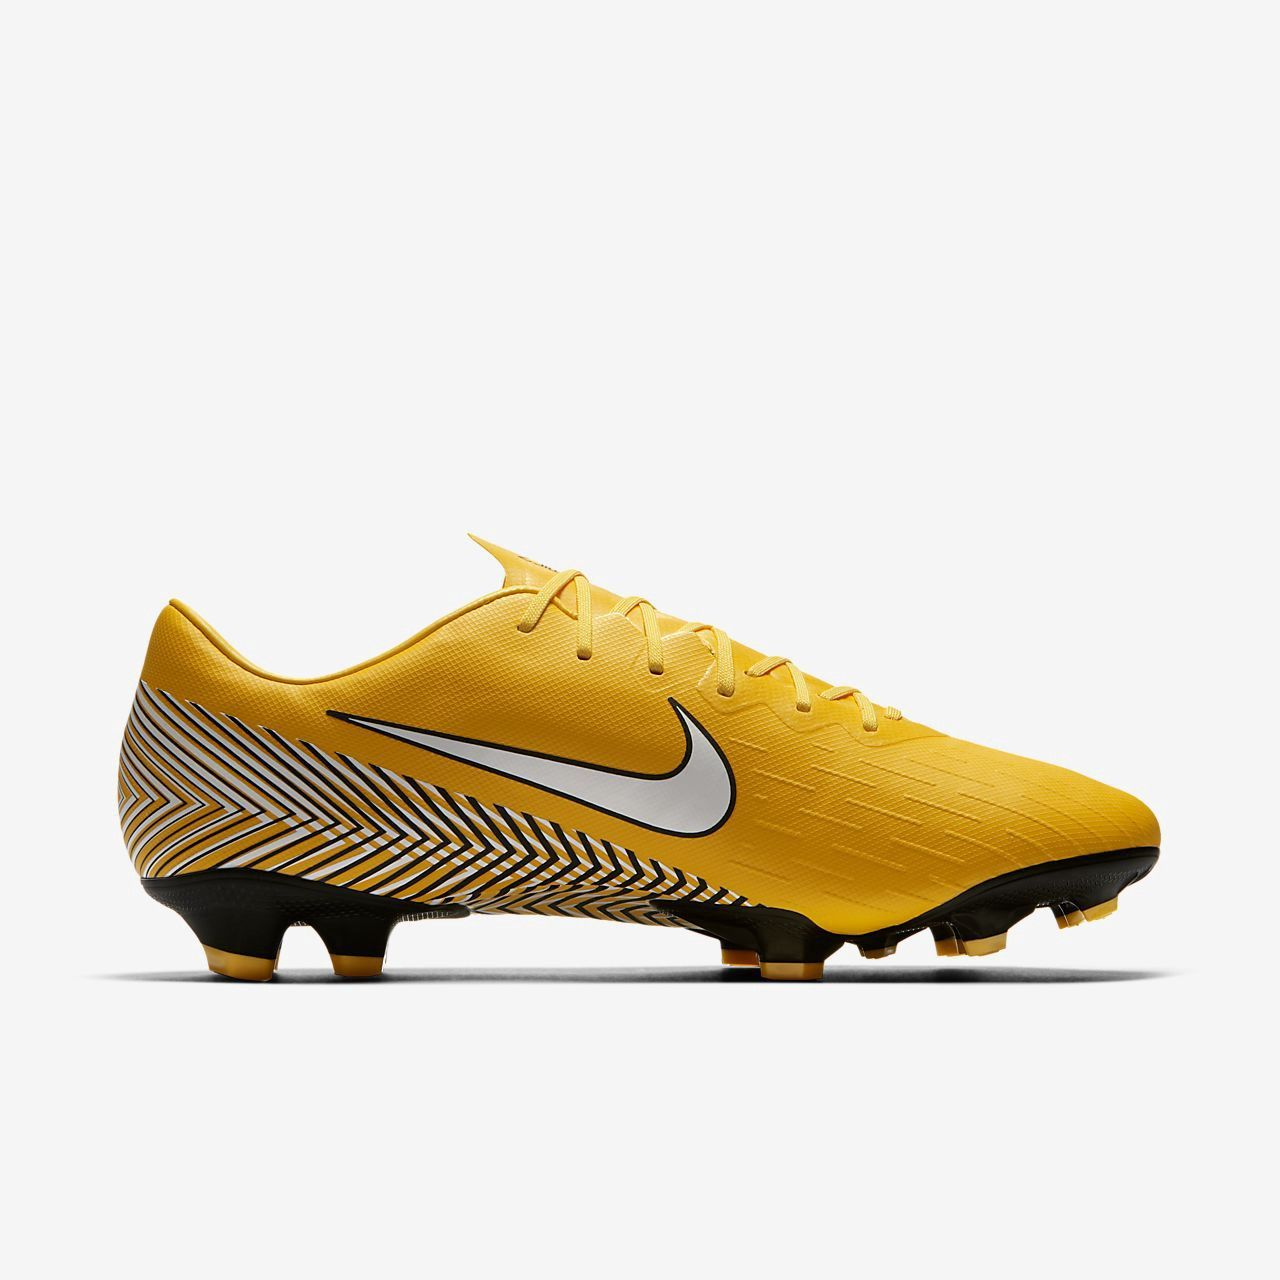 Nike Mercurial Vapor Xii Pro Neymar Jr Men's Firm Ground